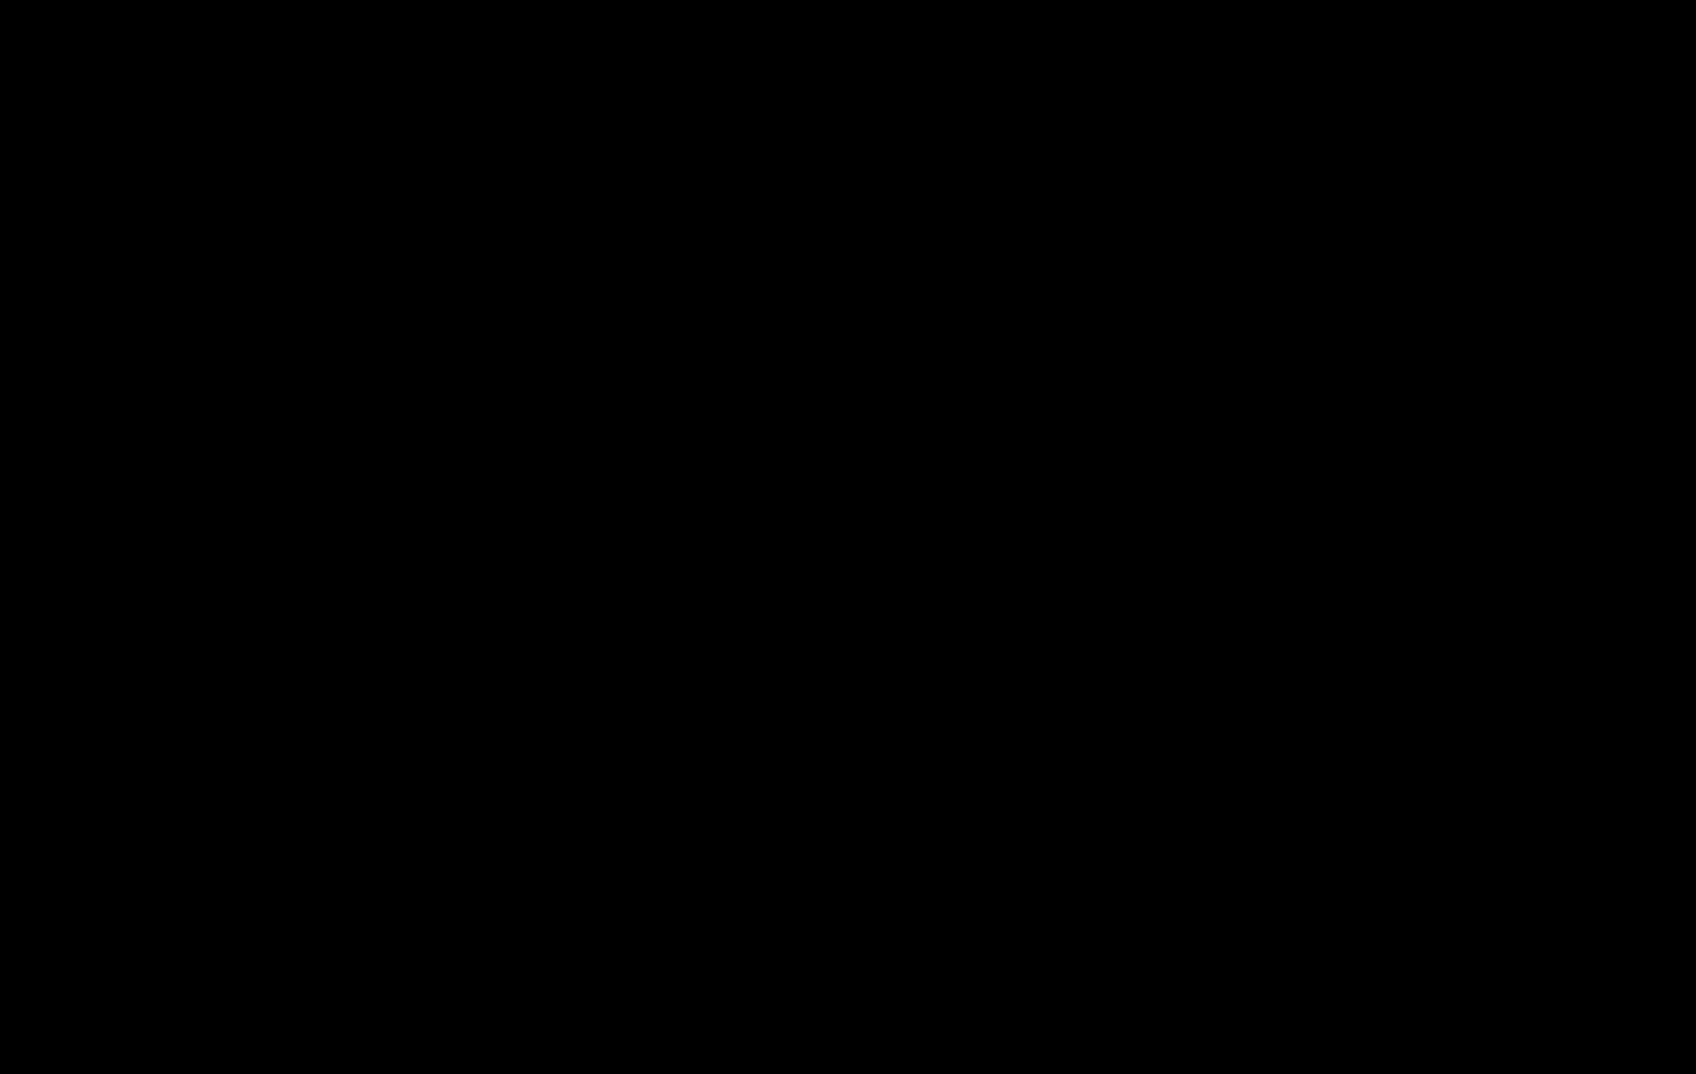 4-(4-Isopropylpiperizinyl)benzeneboronic acid pinacol ester